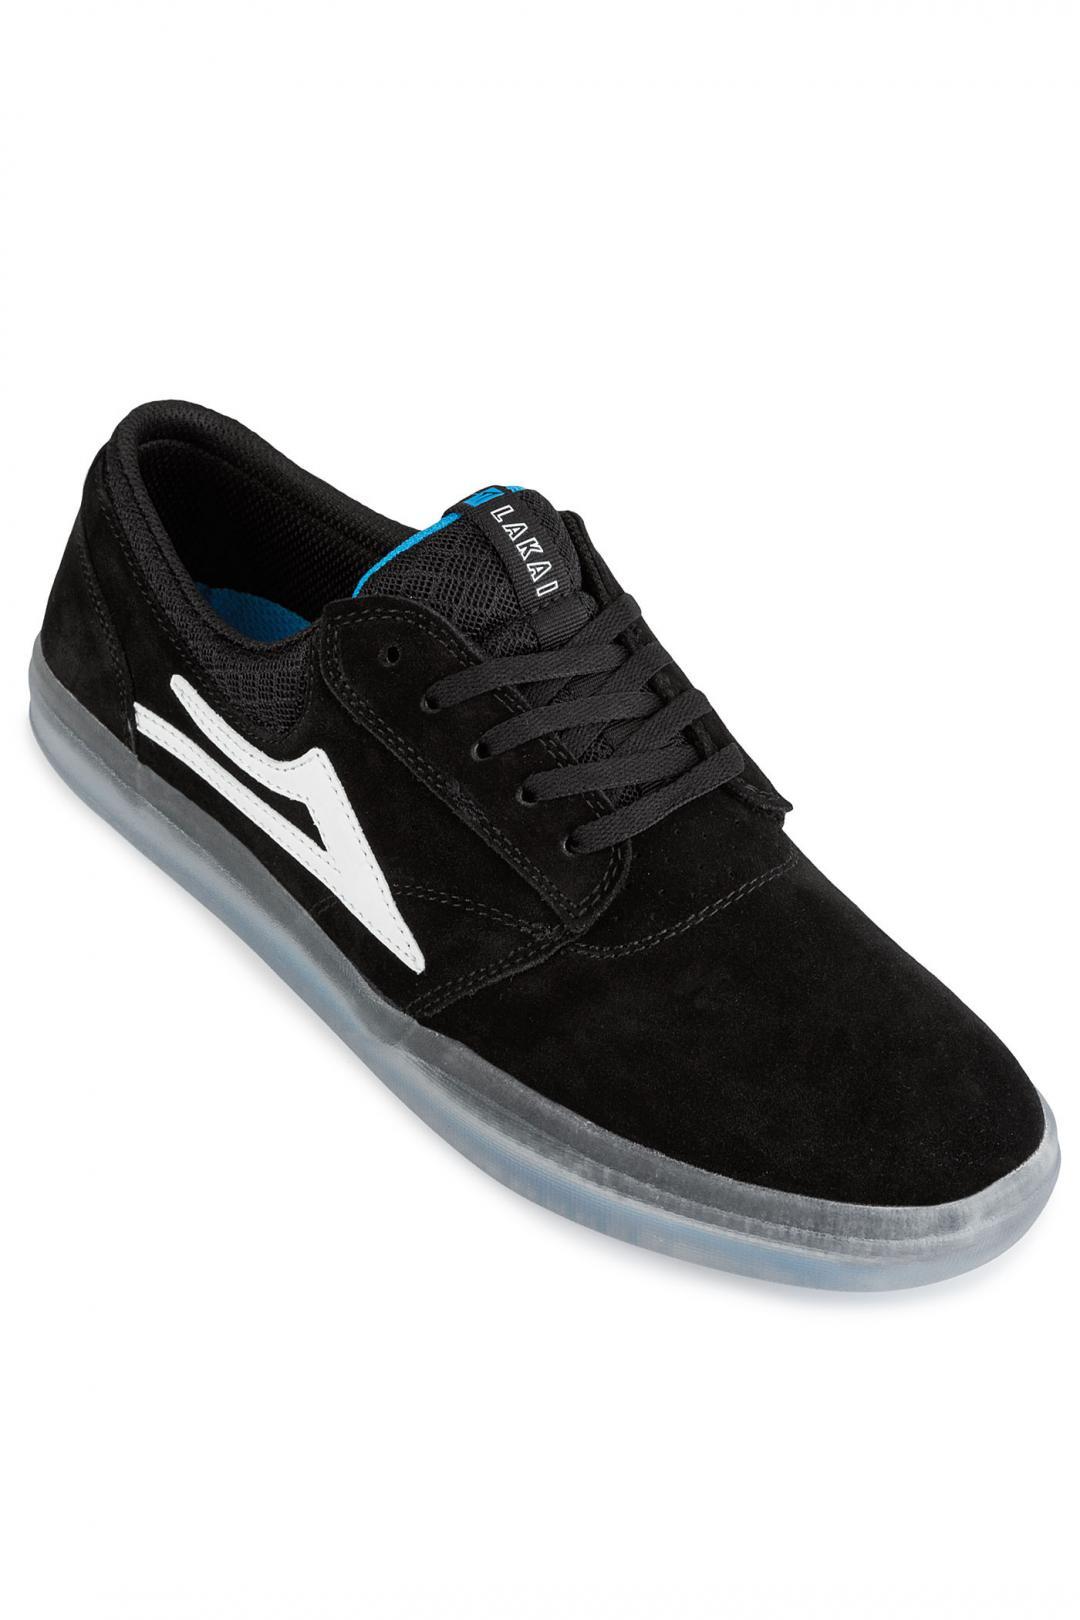 Uomo Lakai Griffin XLK Suede black | Sneakers low top